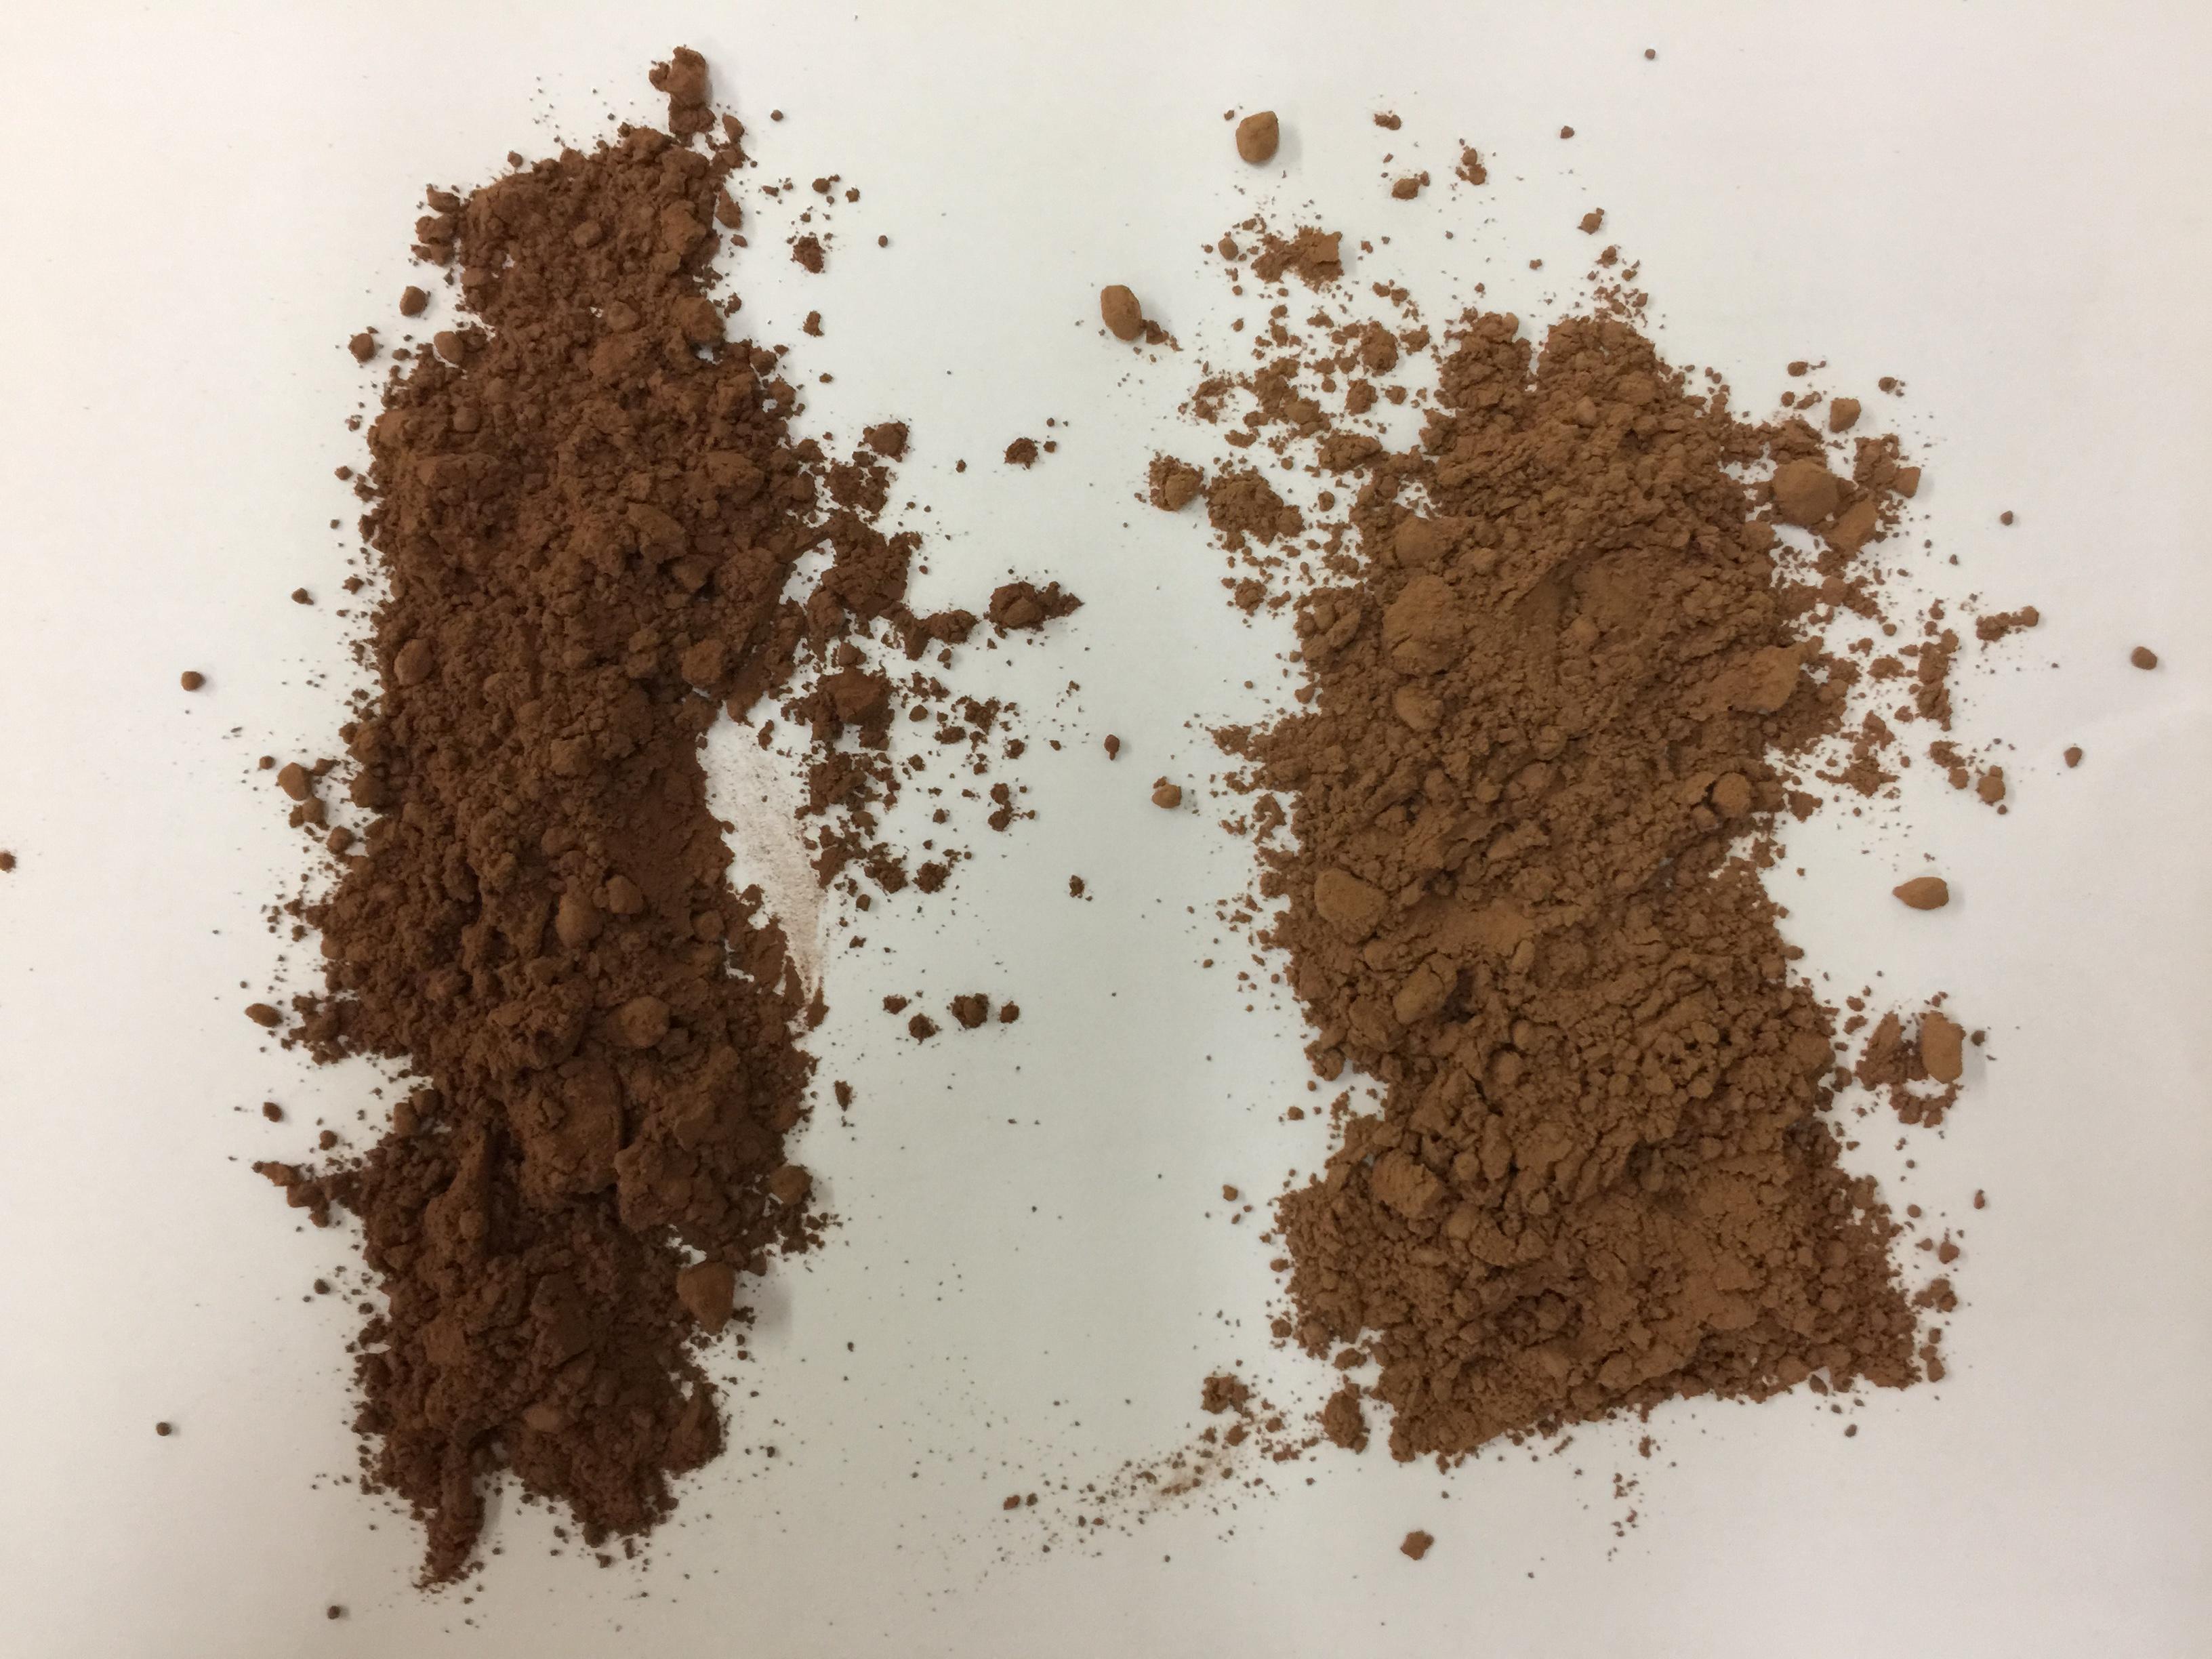 sbc-organic-cocoa-powder.jpg